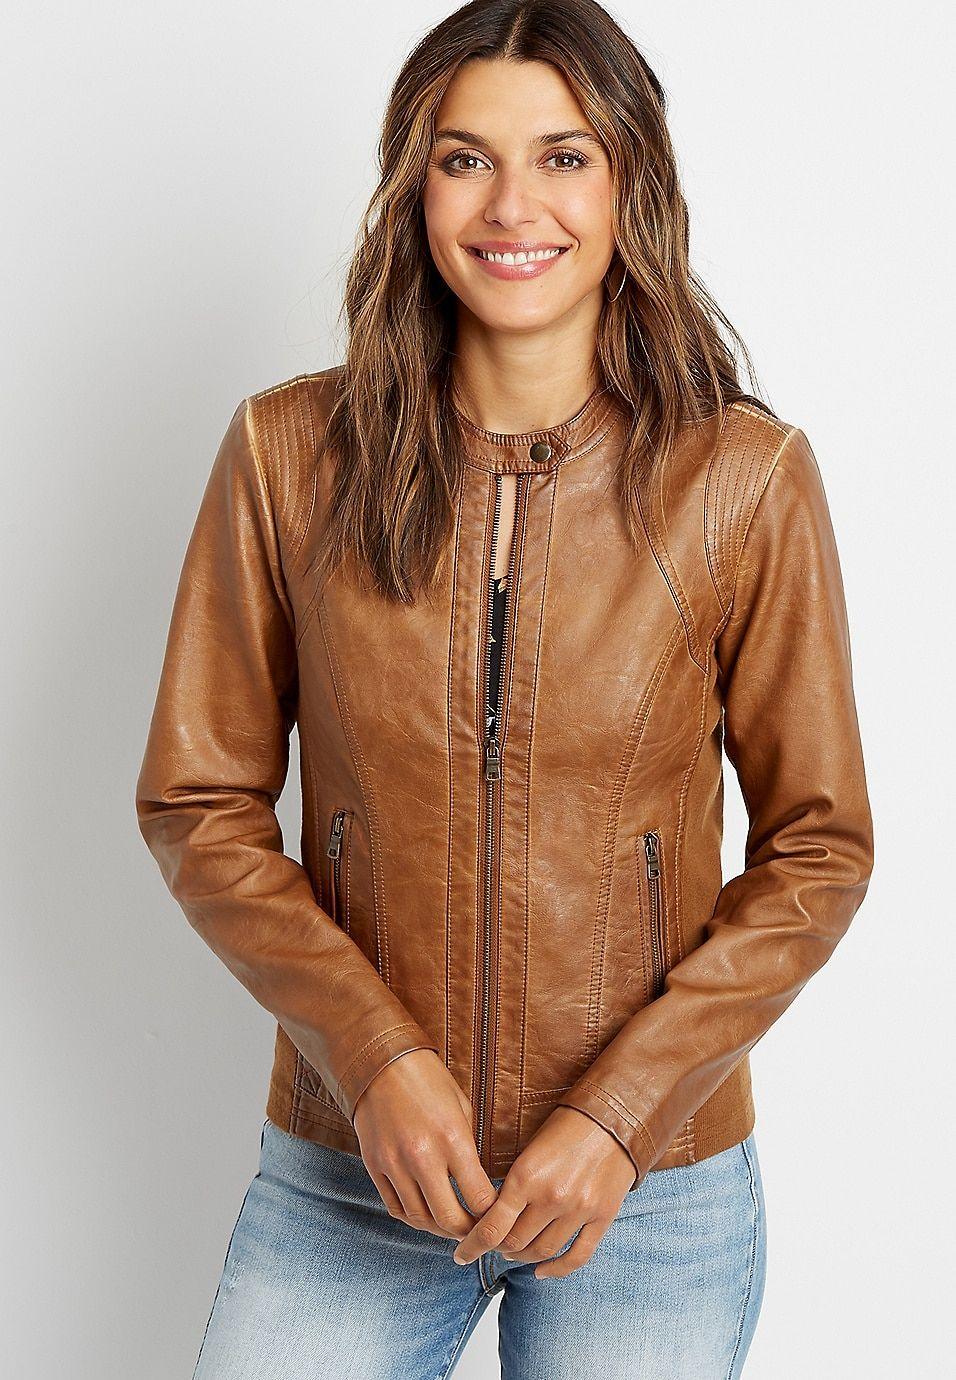 Caramel Basic Faux Leather Jacket Colorful Leather Jacket Faux Leather Jacket Women Leather Jackets Women [ 1380 x 956 Pixel ]